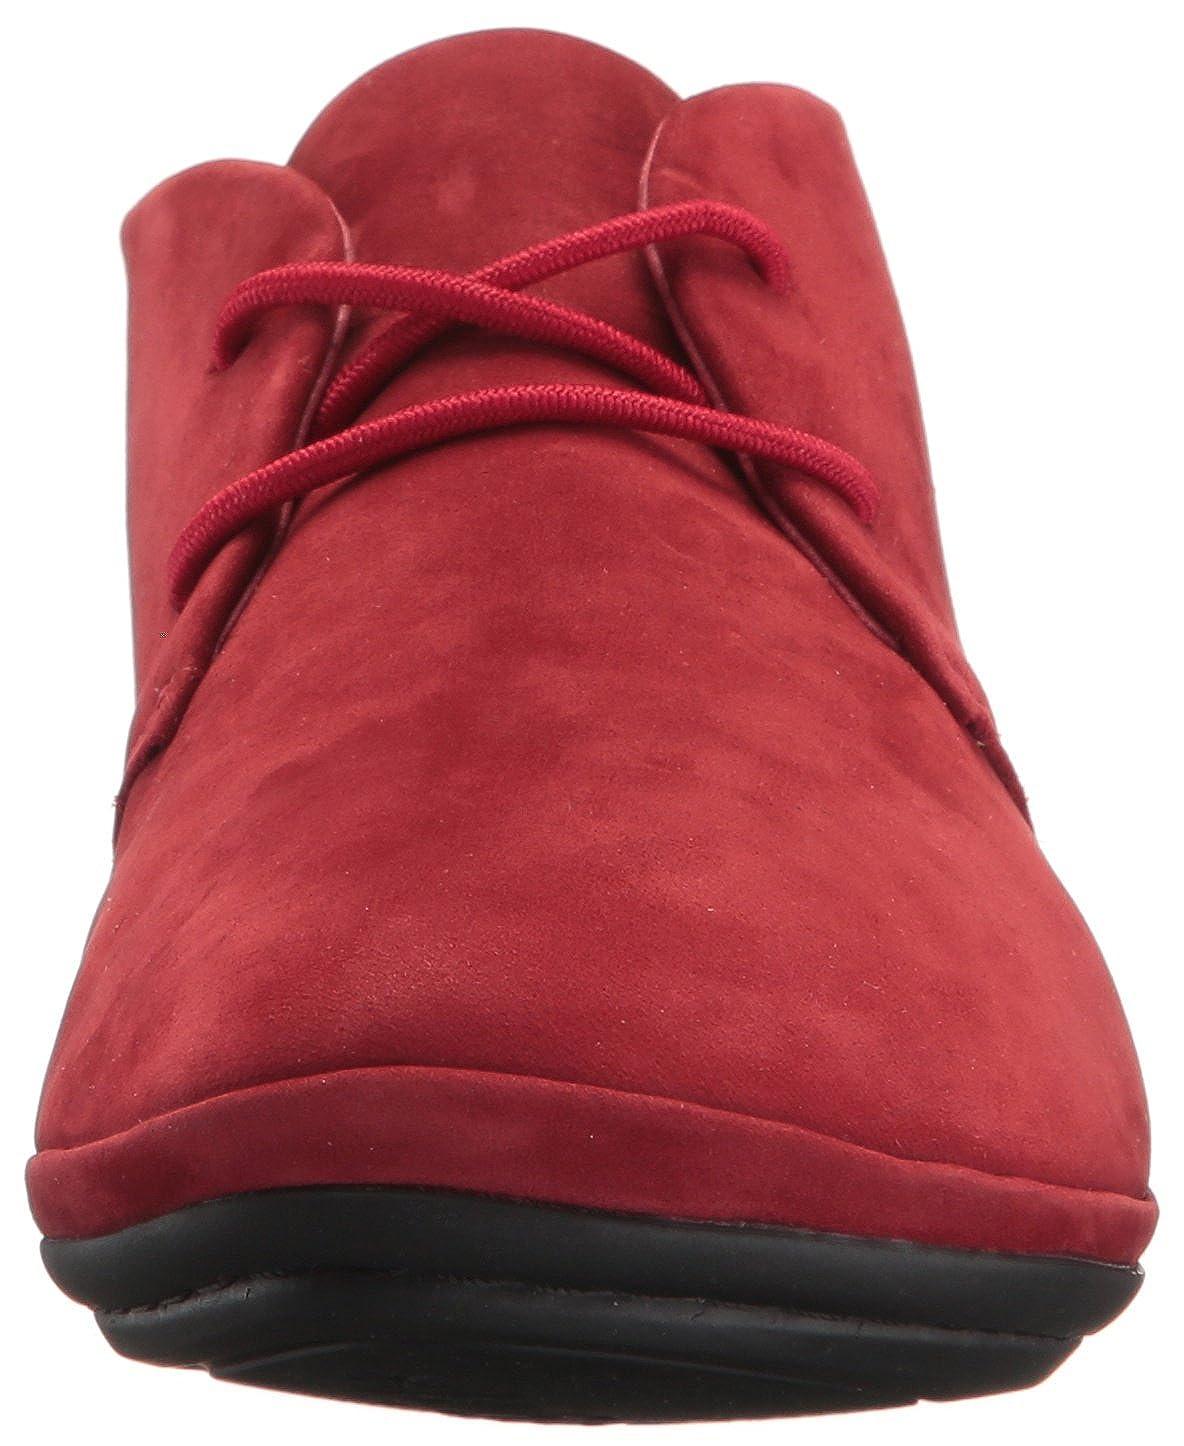 bda8236e7739b Camper Right K400221-001 Casual Shoes Women Red